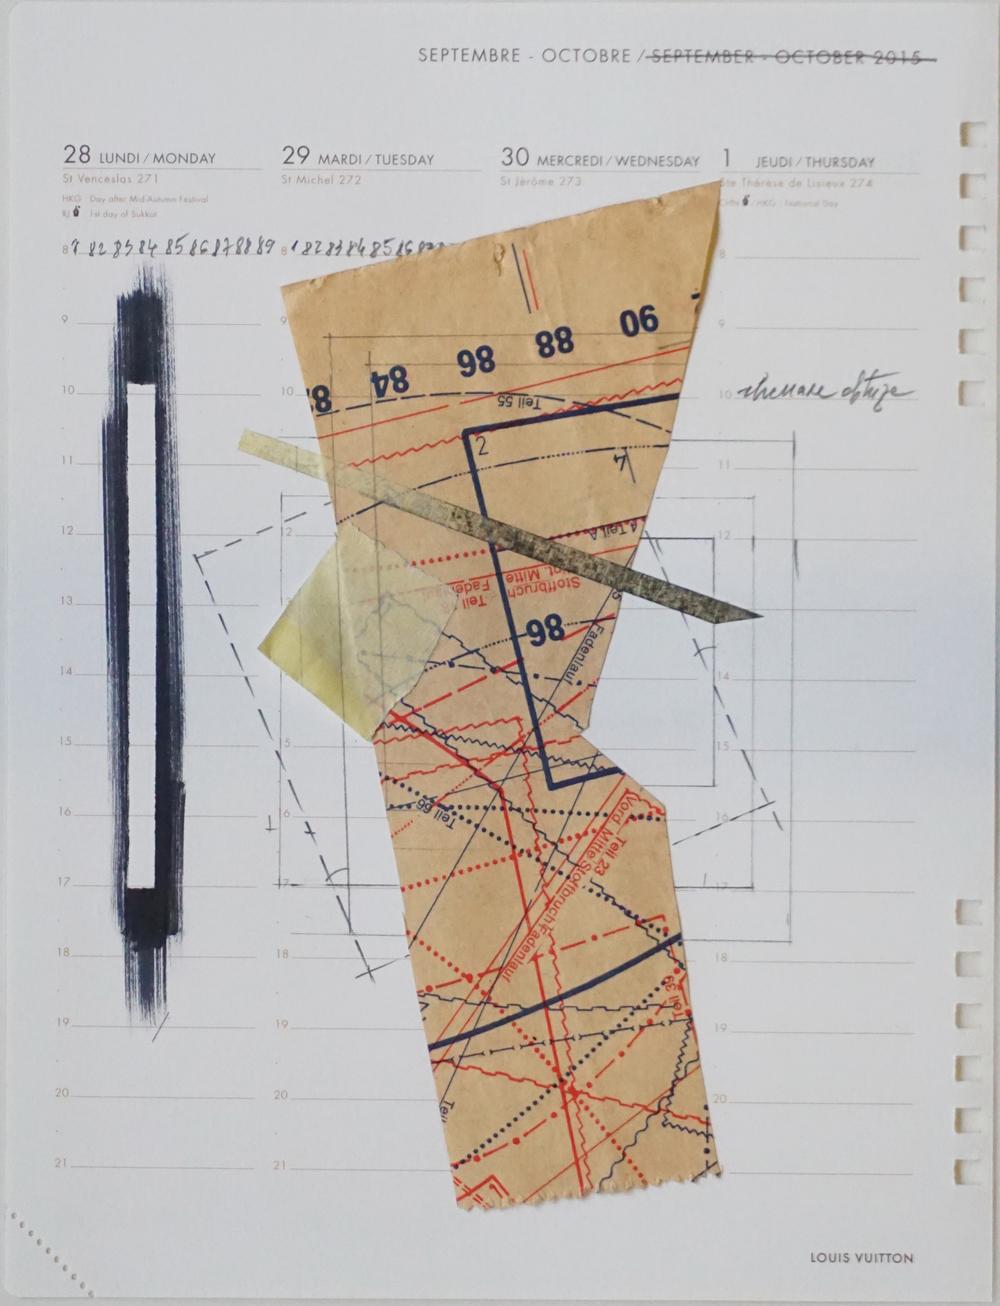 Temporel Louis Vuitton 5 (2015) mixed media on paper 22 x 16 cm